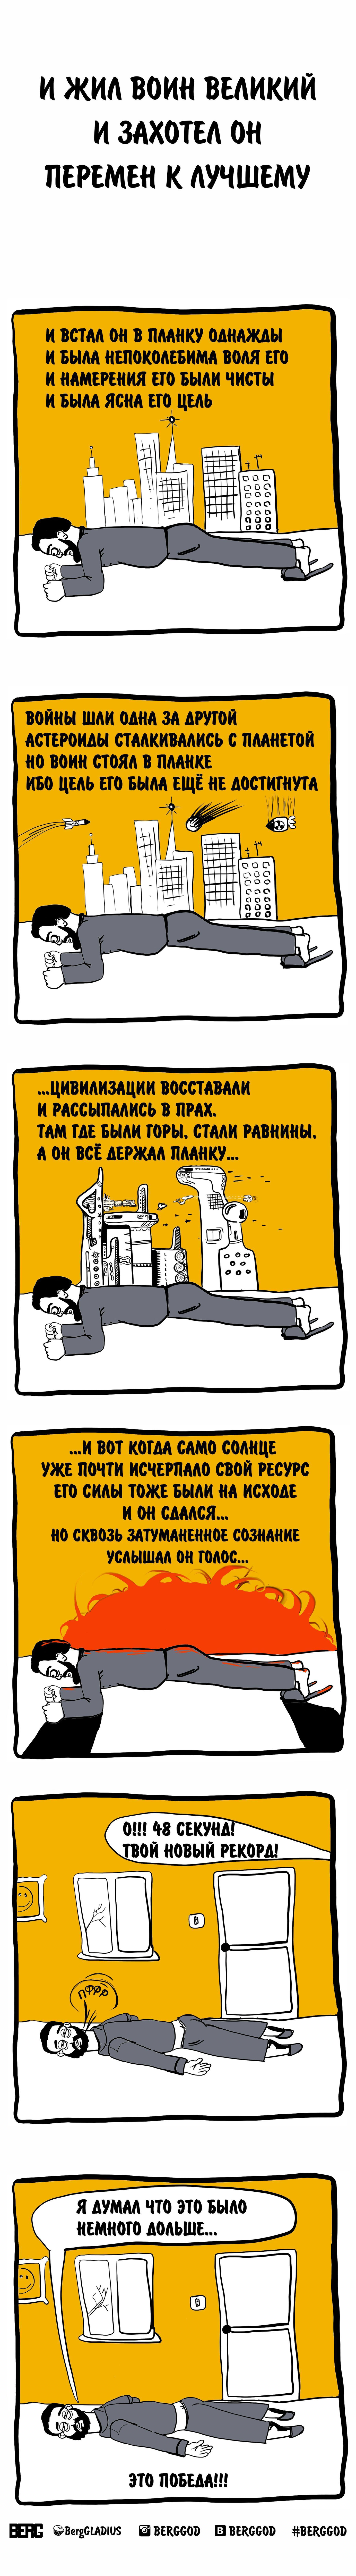 https://cs12.pikabu.ru/post_img/big/2020/04/25/6/1587804712155763440.jpg